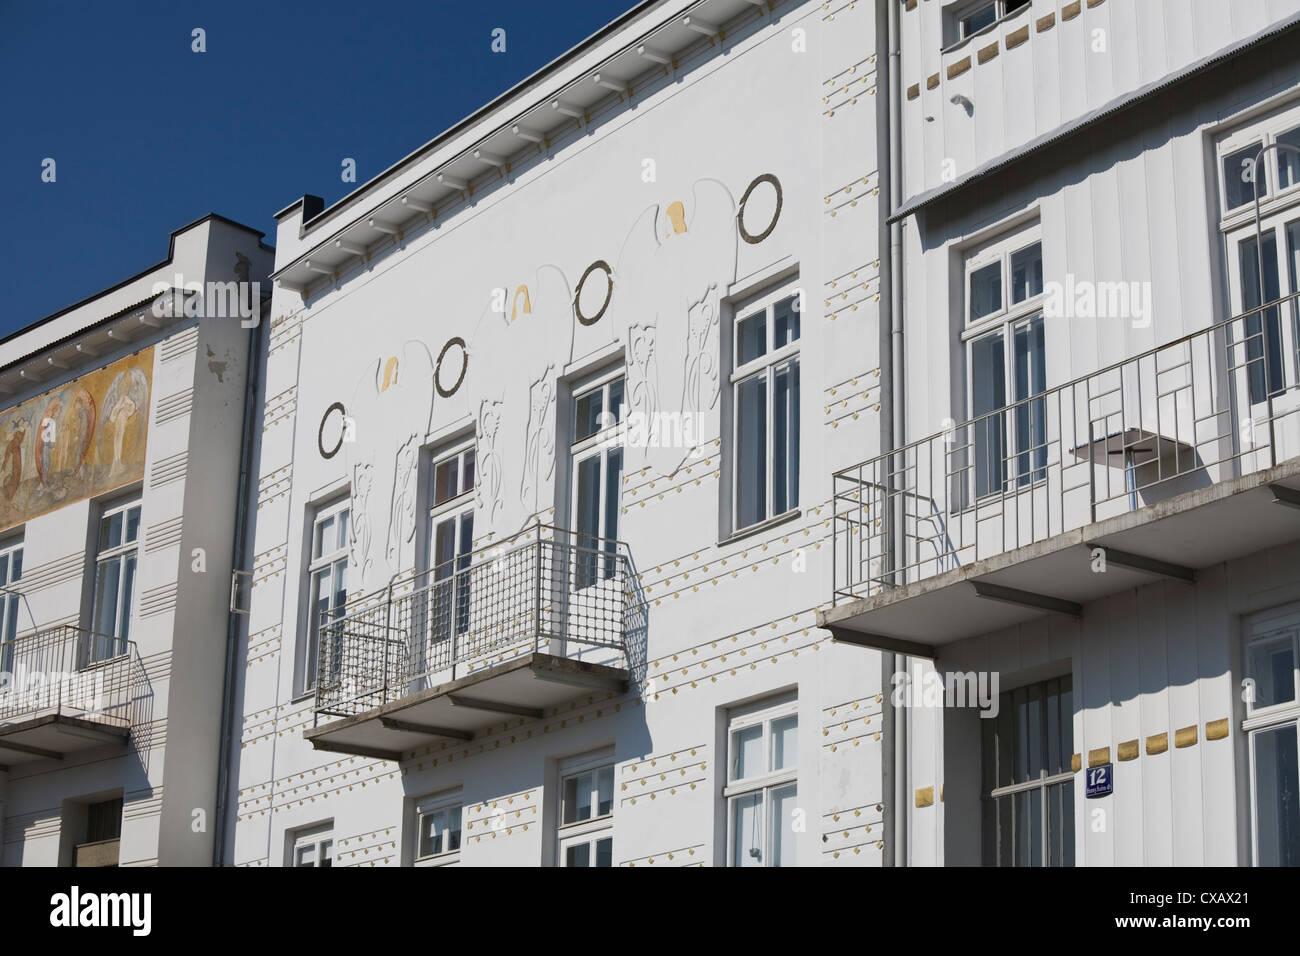 Art Deco Houses, Brunn am Gebirge, near Modling, Lower Austria, Austria, Europe - Stock Image